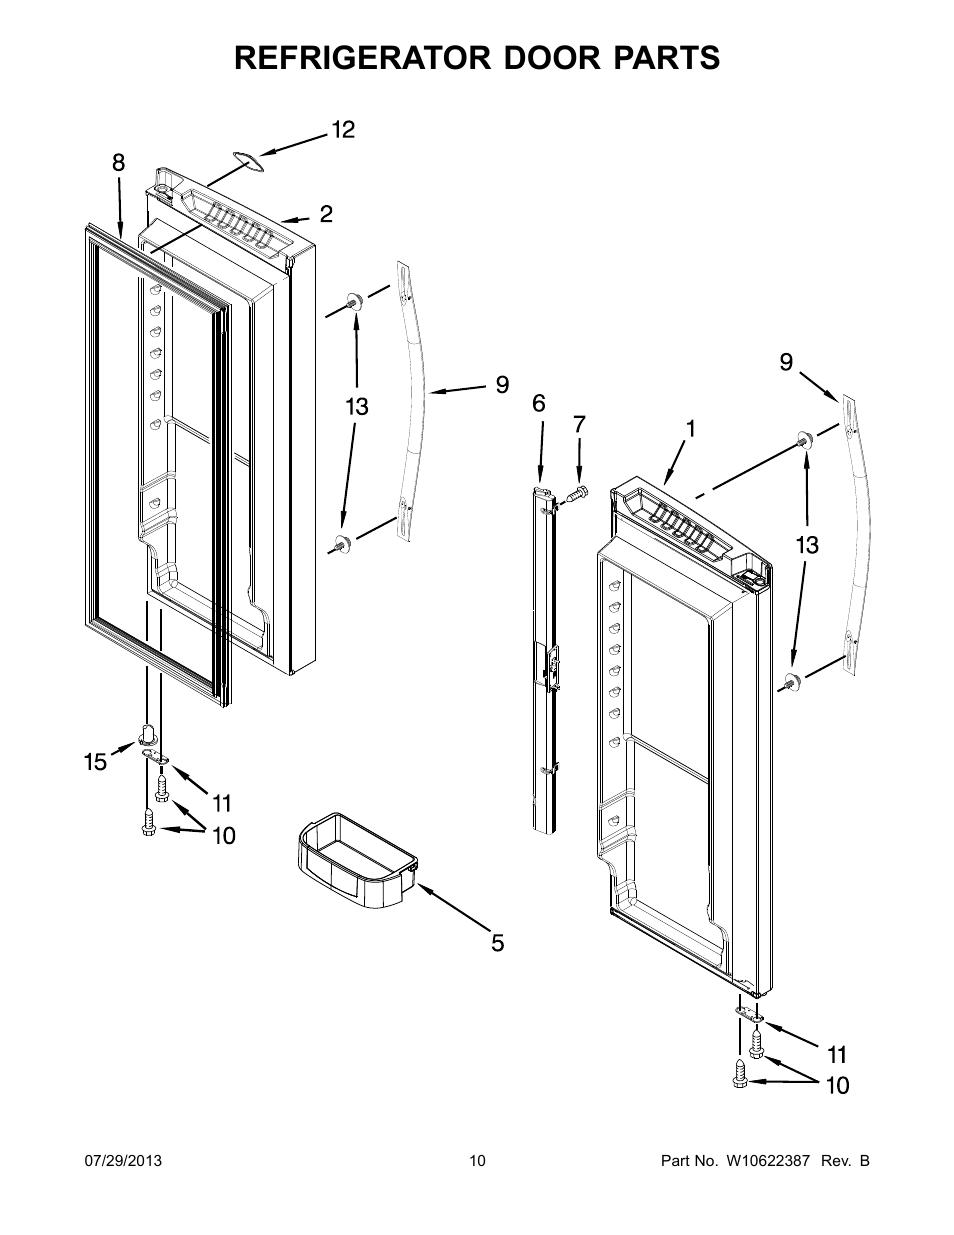 refrigerator door  refrigerator door parts whirlpool Whirlpool Refrigerator Parts Diagram whirlpool refrigerator parts manual